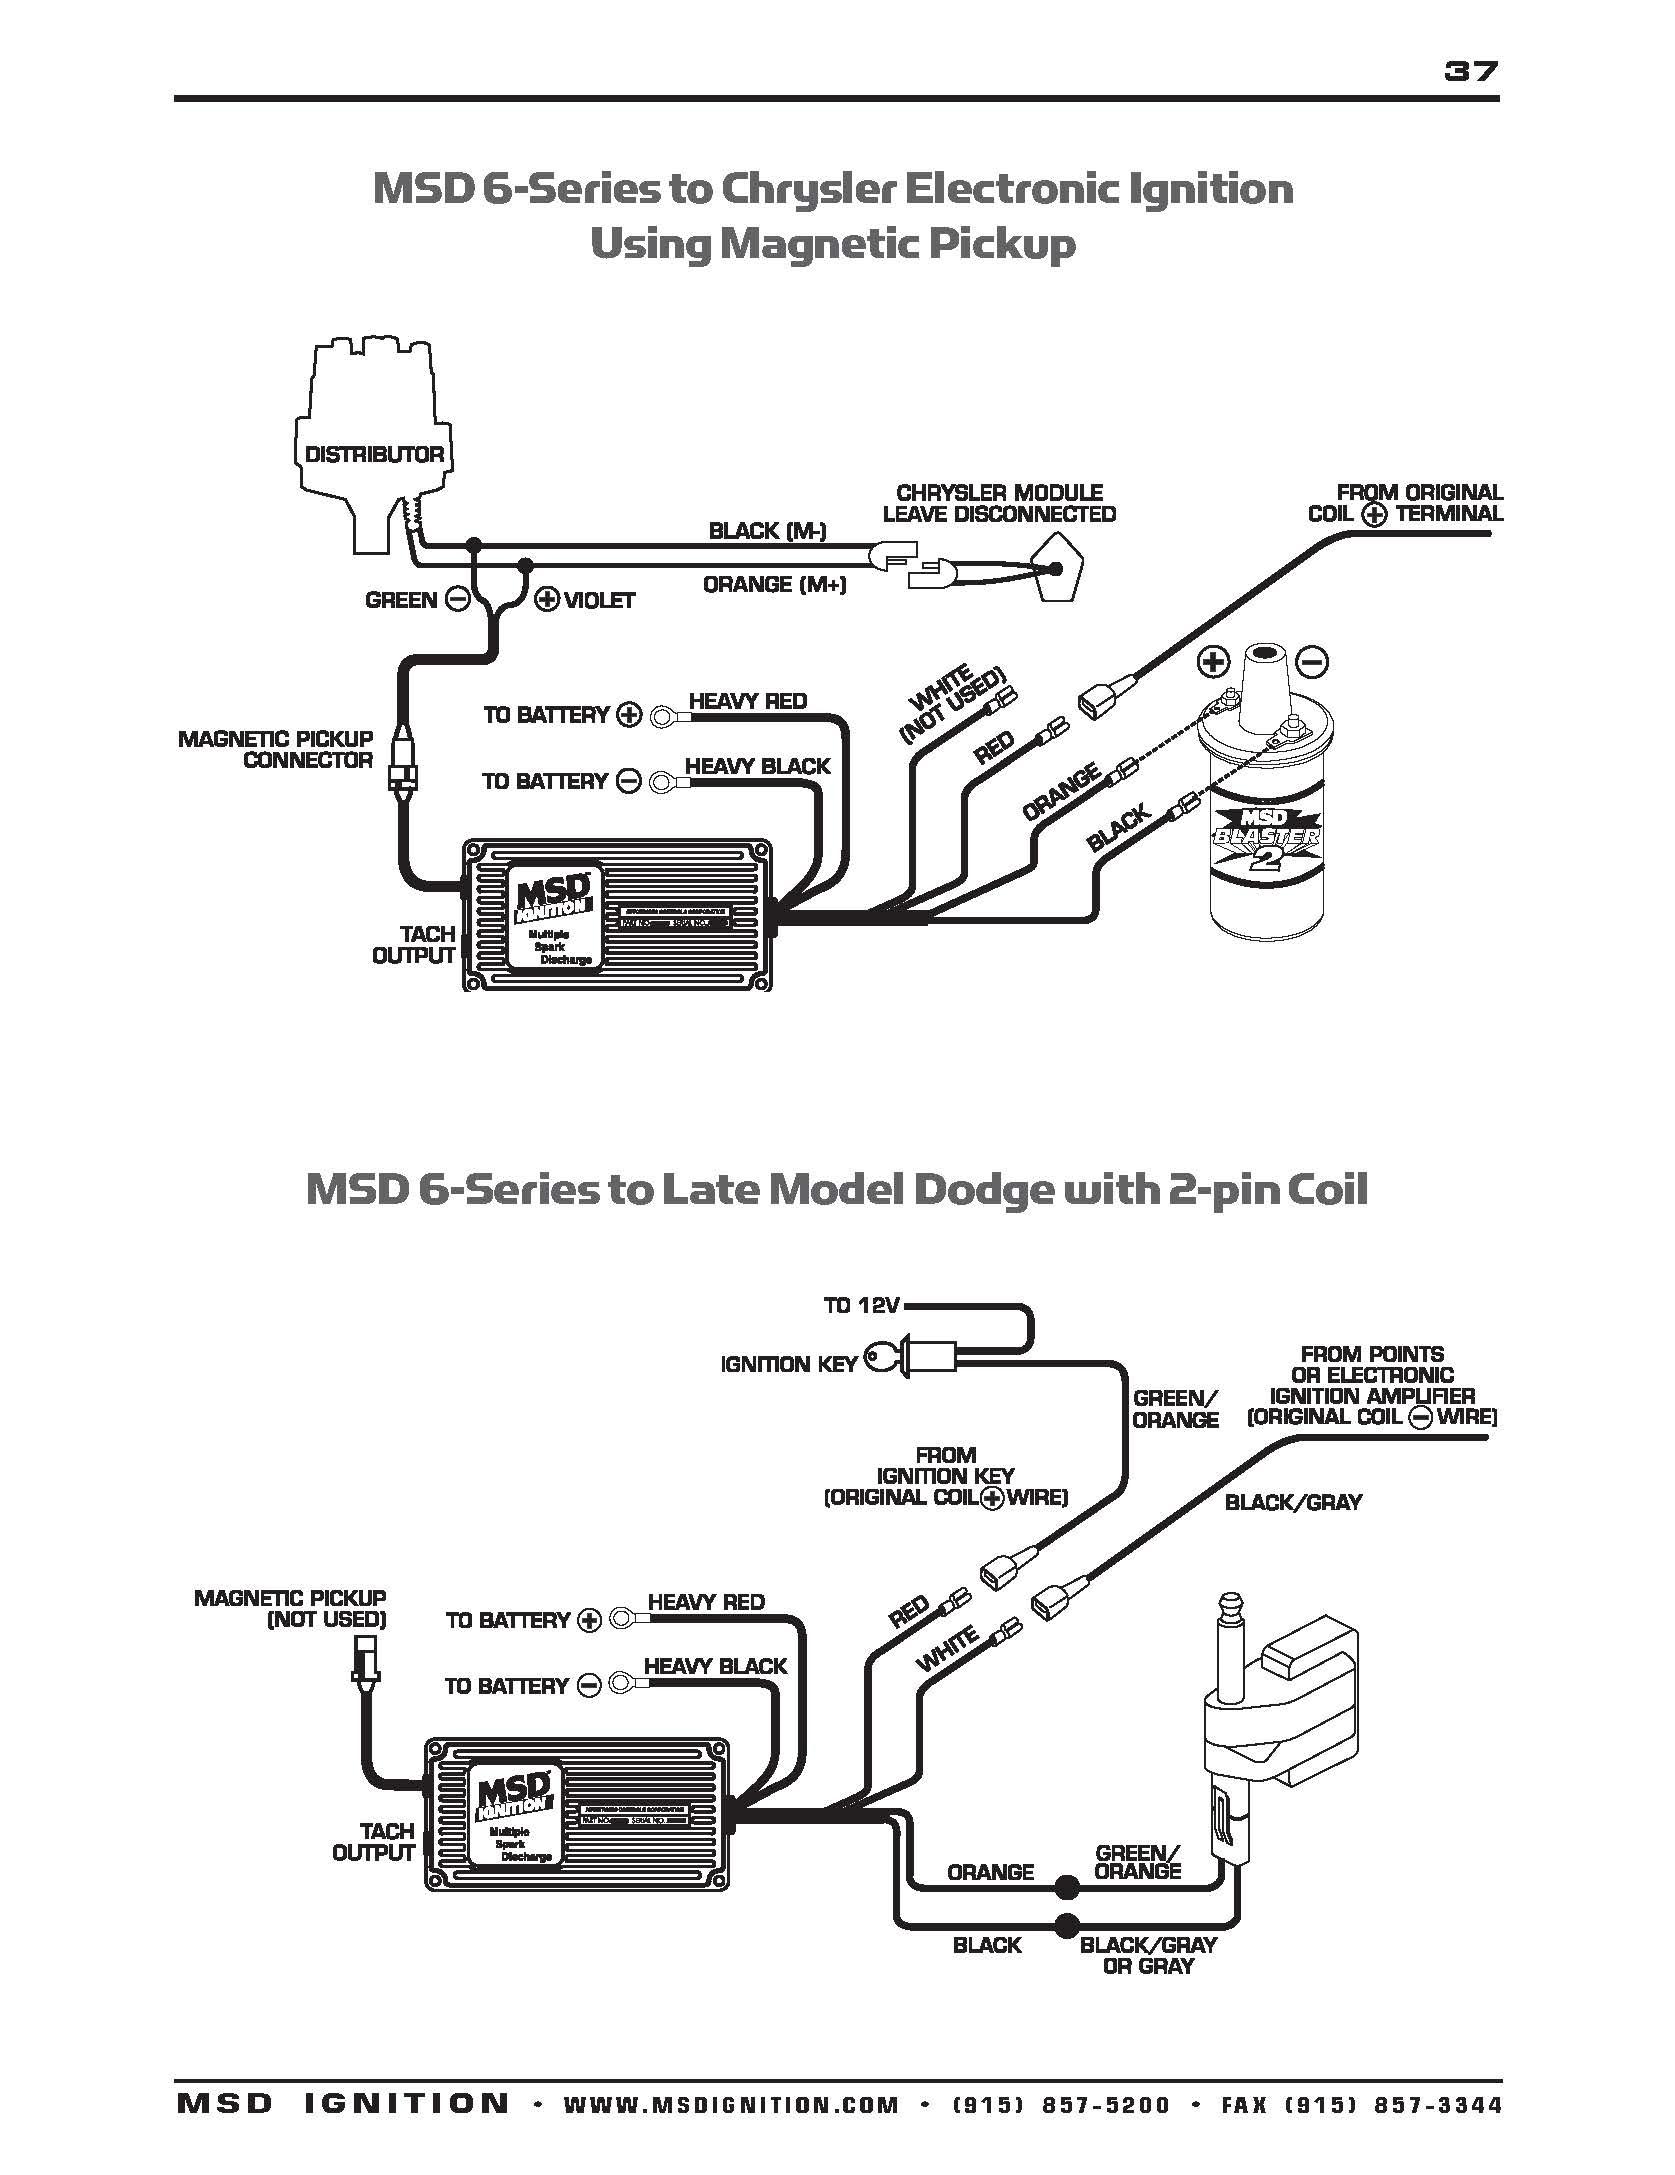 Ford Msd 6Al Wiring Diagram | Manual E-Books - Msd 6Al Wiring Diagram Ford